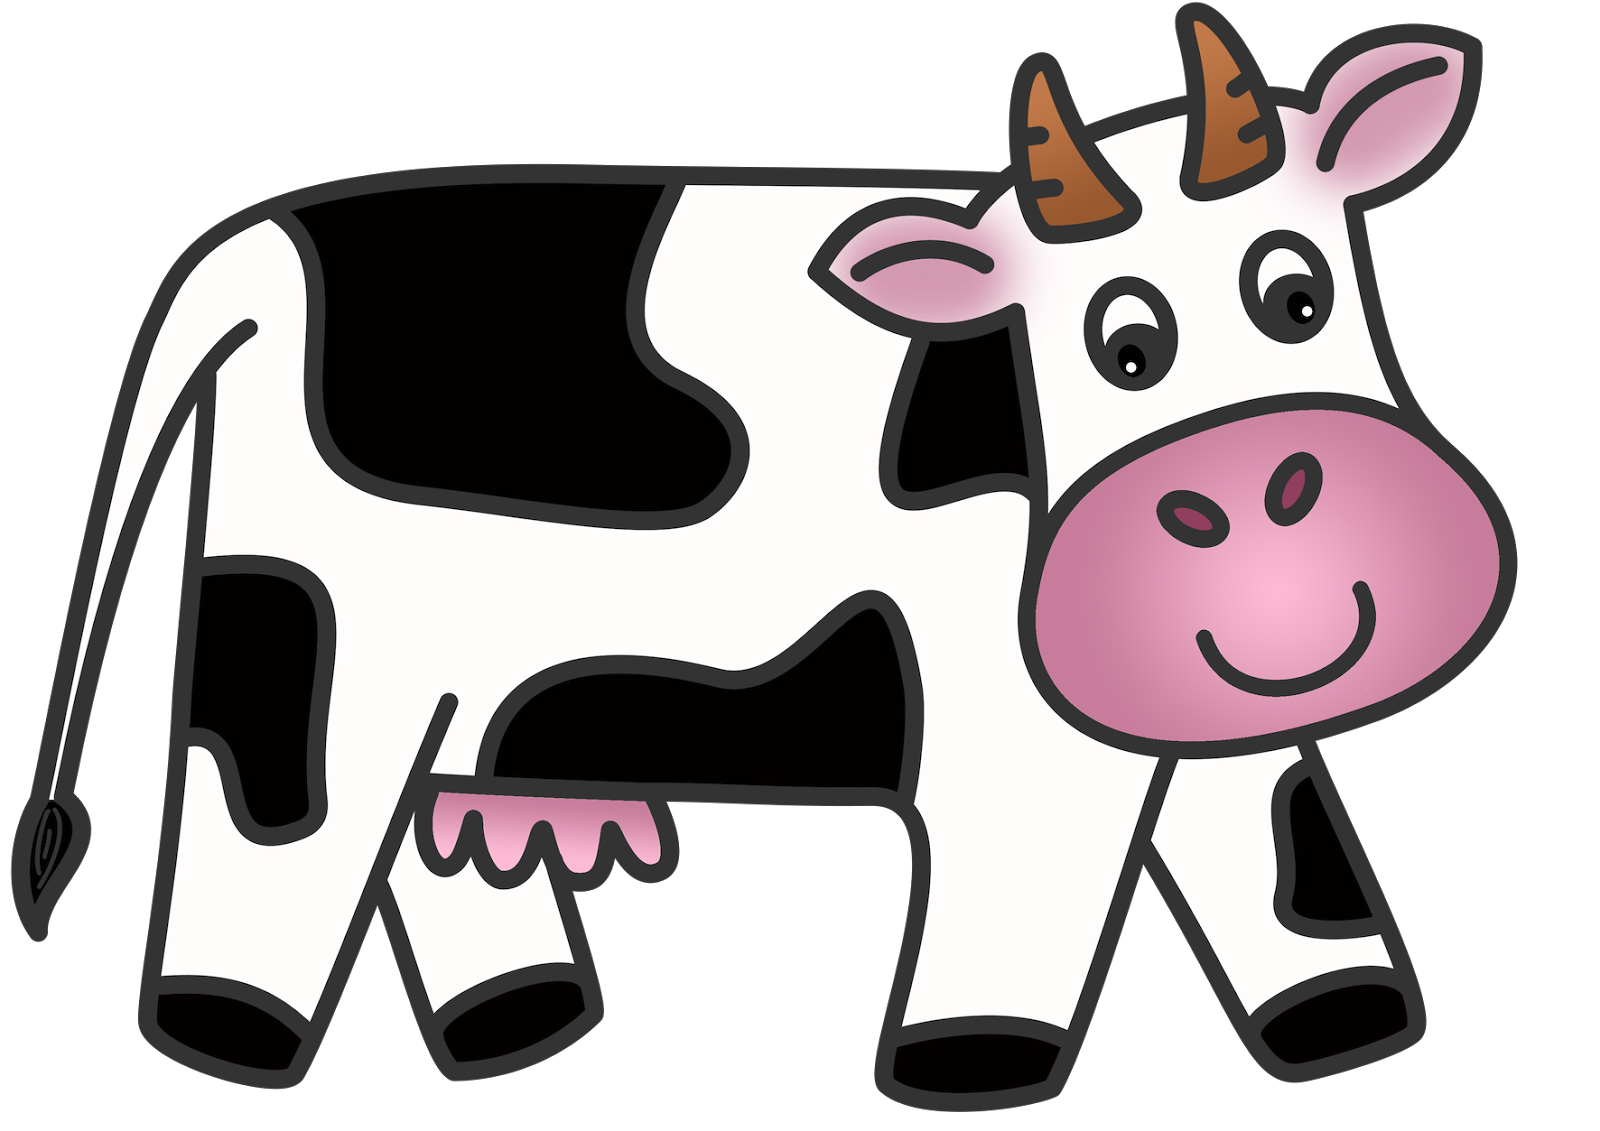 Clipart Cows U0026 Cows Clip Art Images -Clipart Cows u0026 Cows Clip Art Images - ClipartALL clipartall.com-3